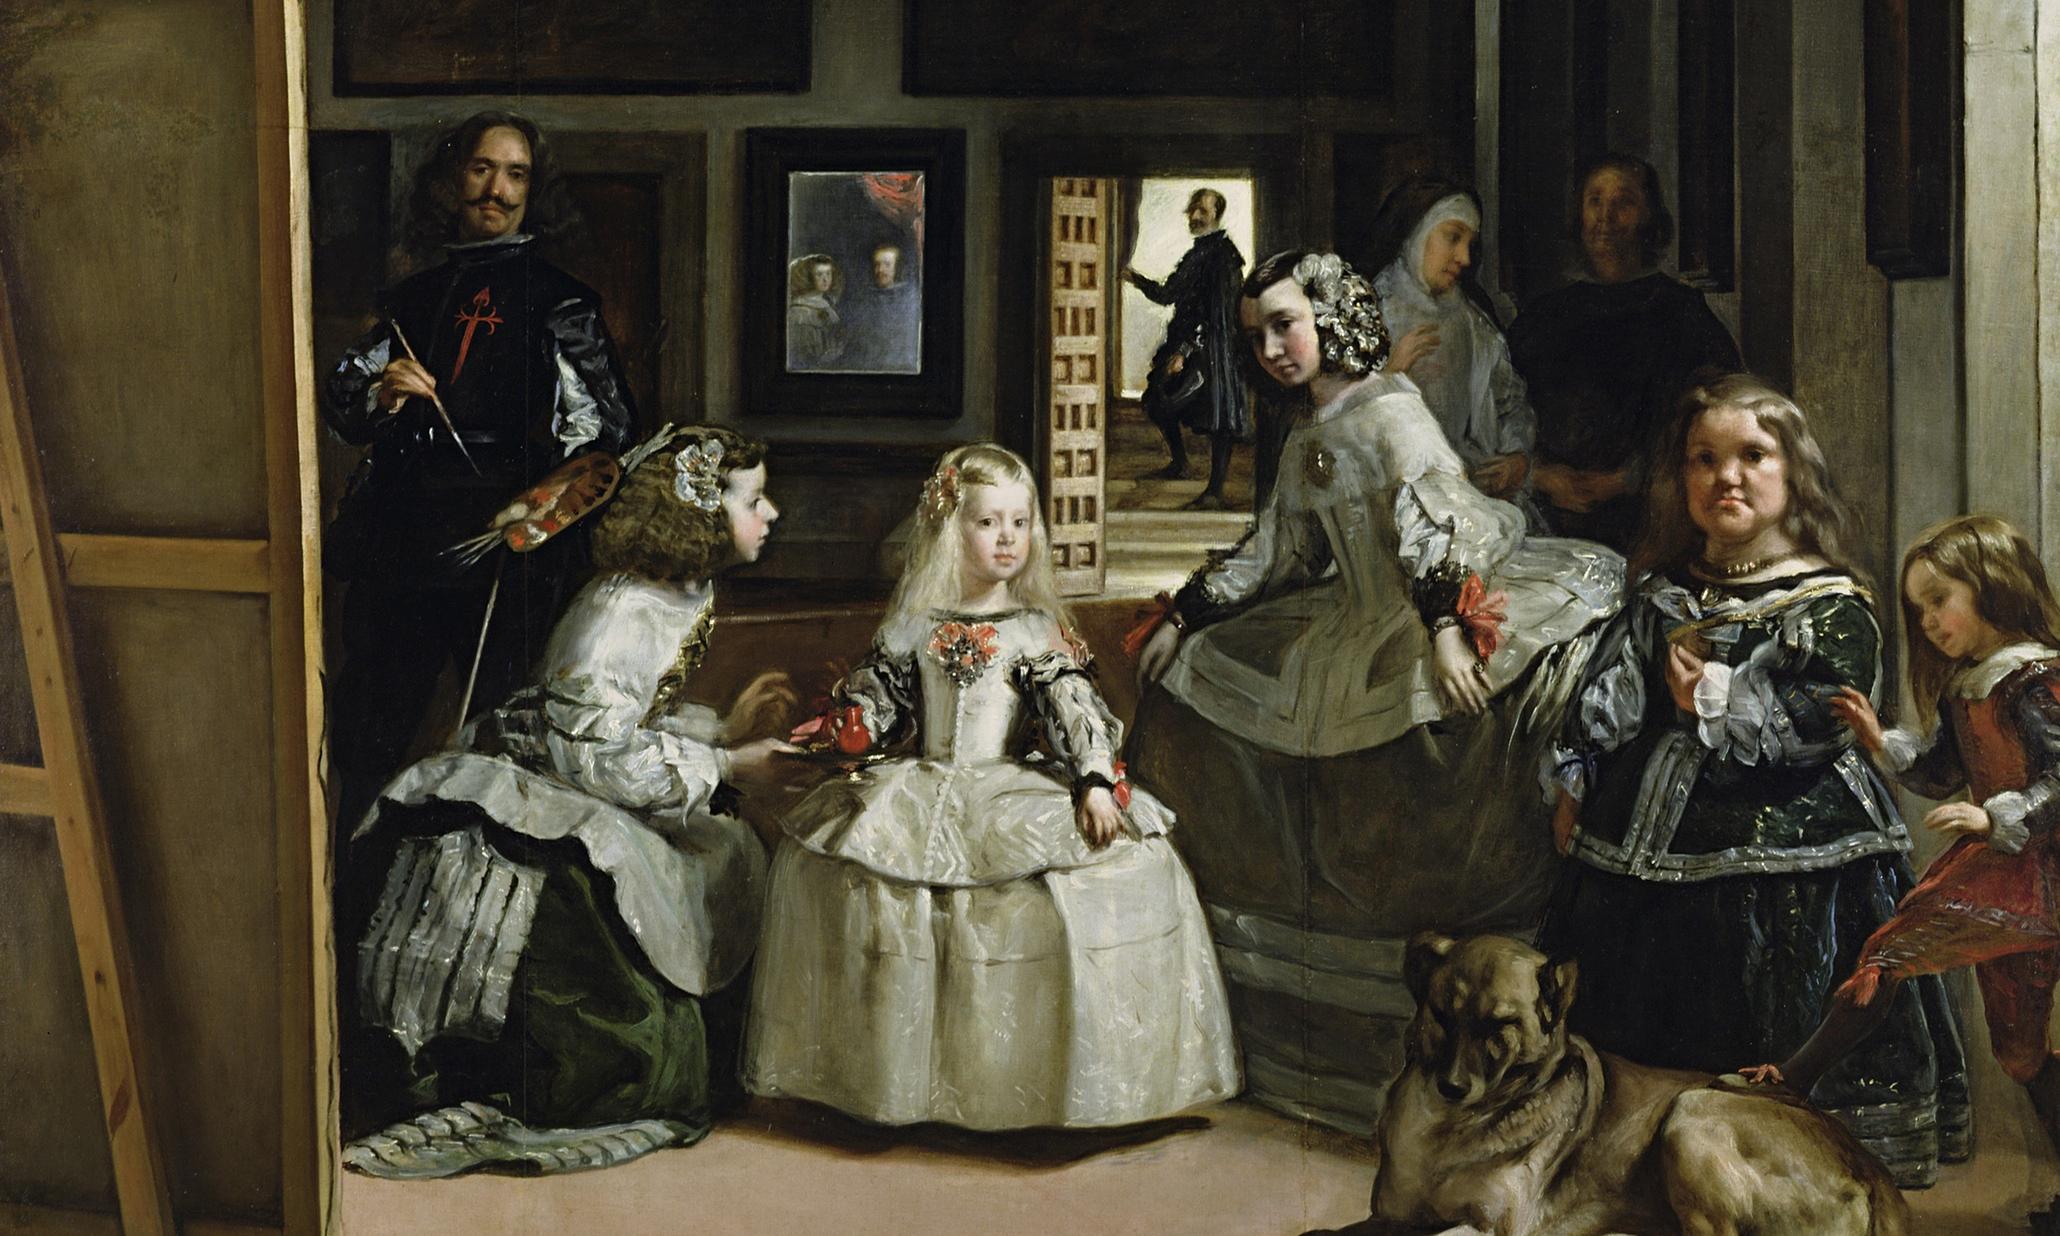 Las Meninas 1656 (Diego Velázquez)